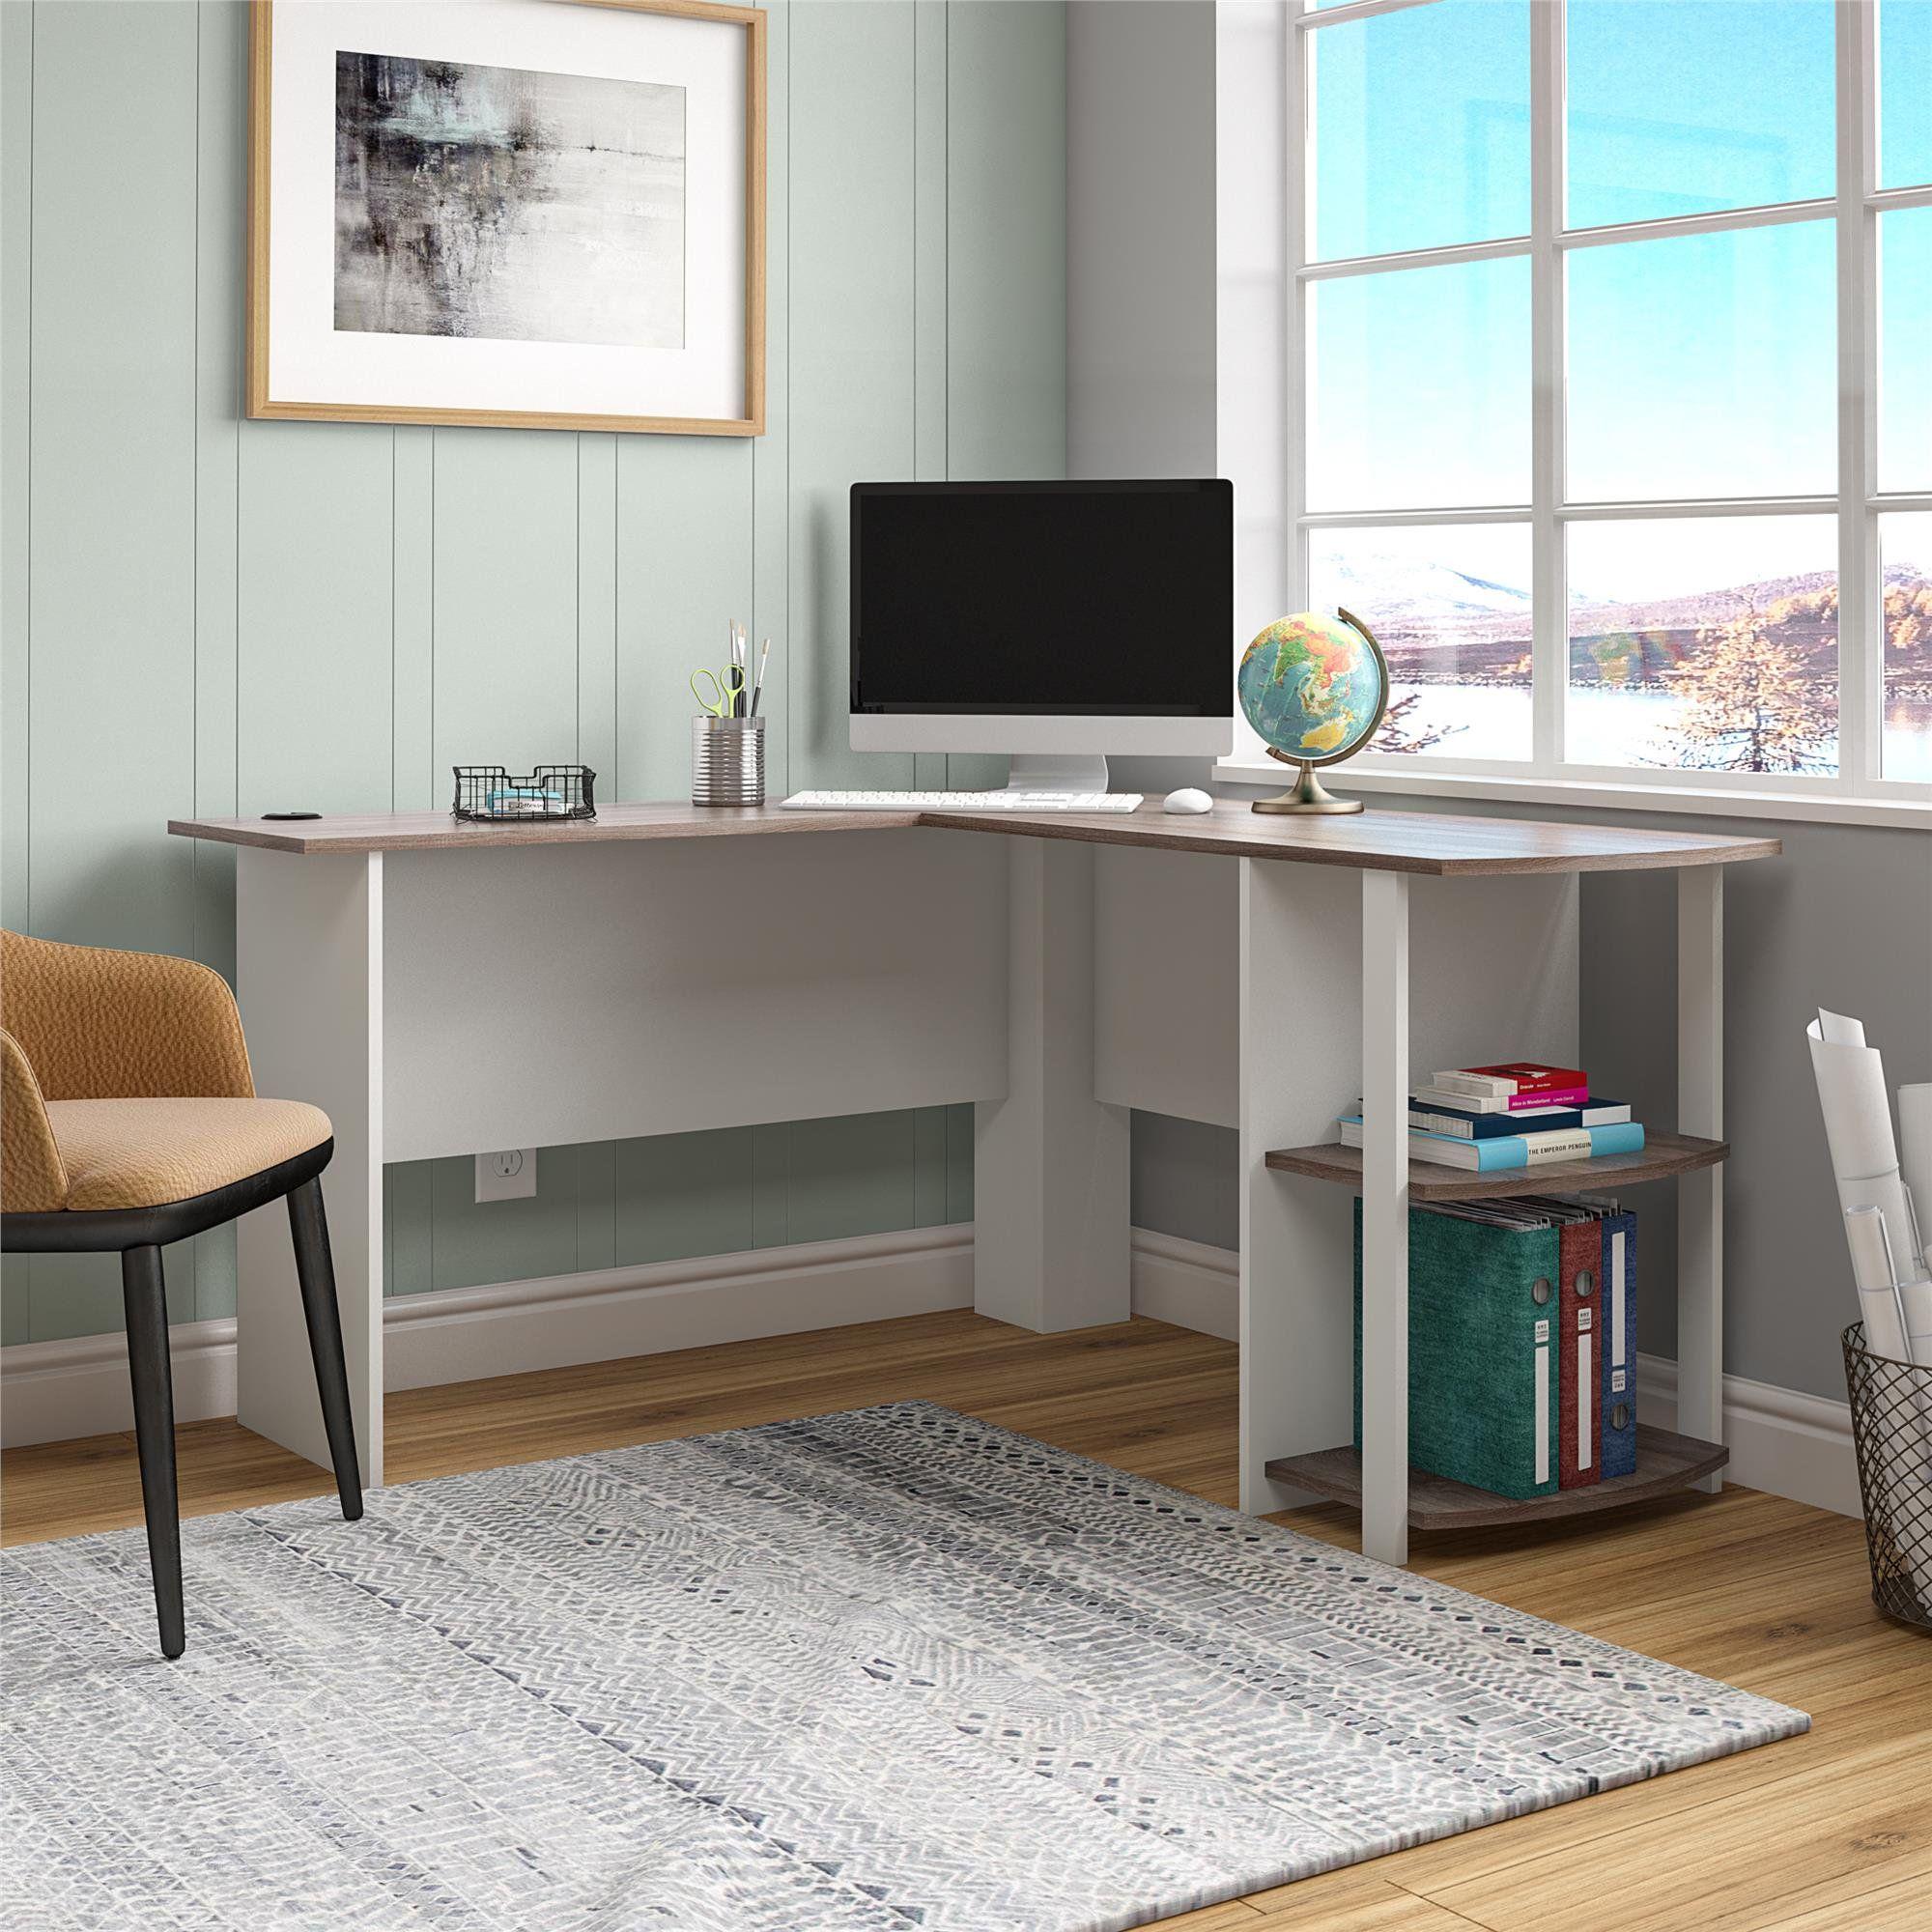 Ameriwood Home Dominic L Desk with Bookshelves, Espresso - Walmart